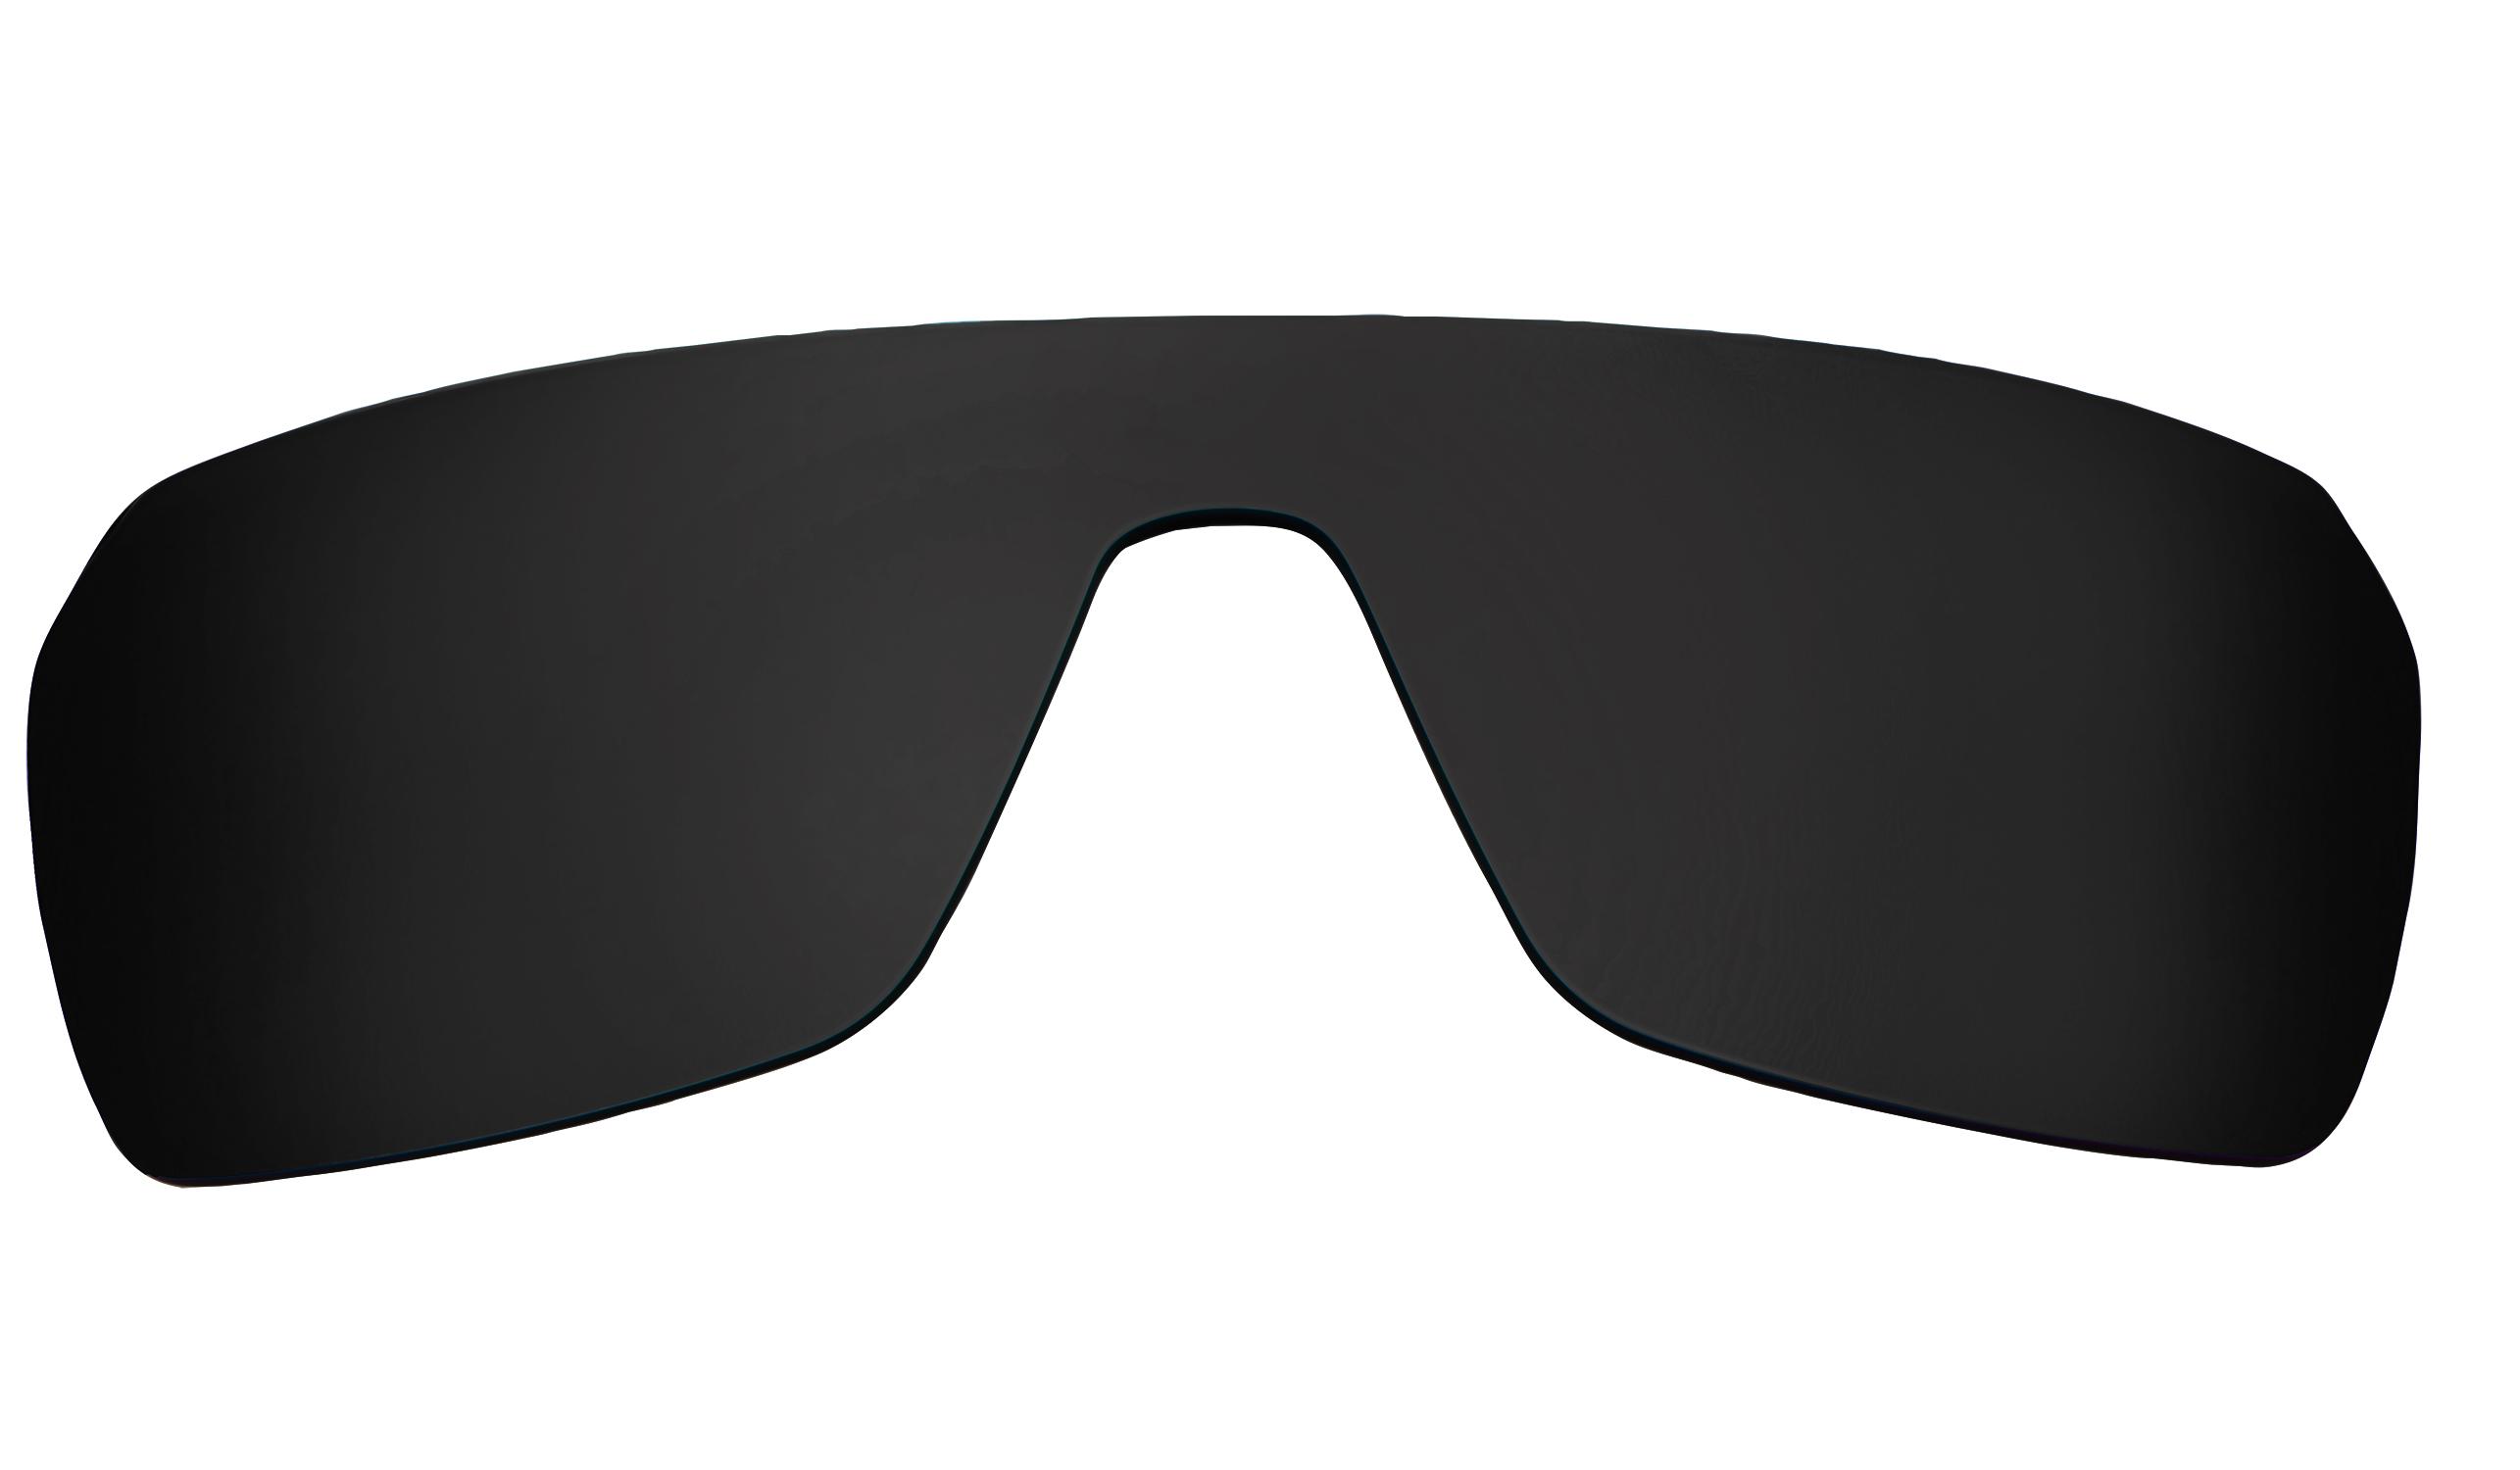 cd37dd56fed68 Flynn Replacement Lenses Polarized Black by SEEK fits SPY OPTICS Sunglasses